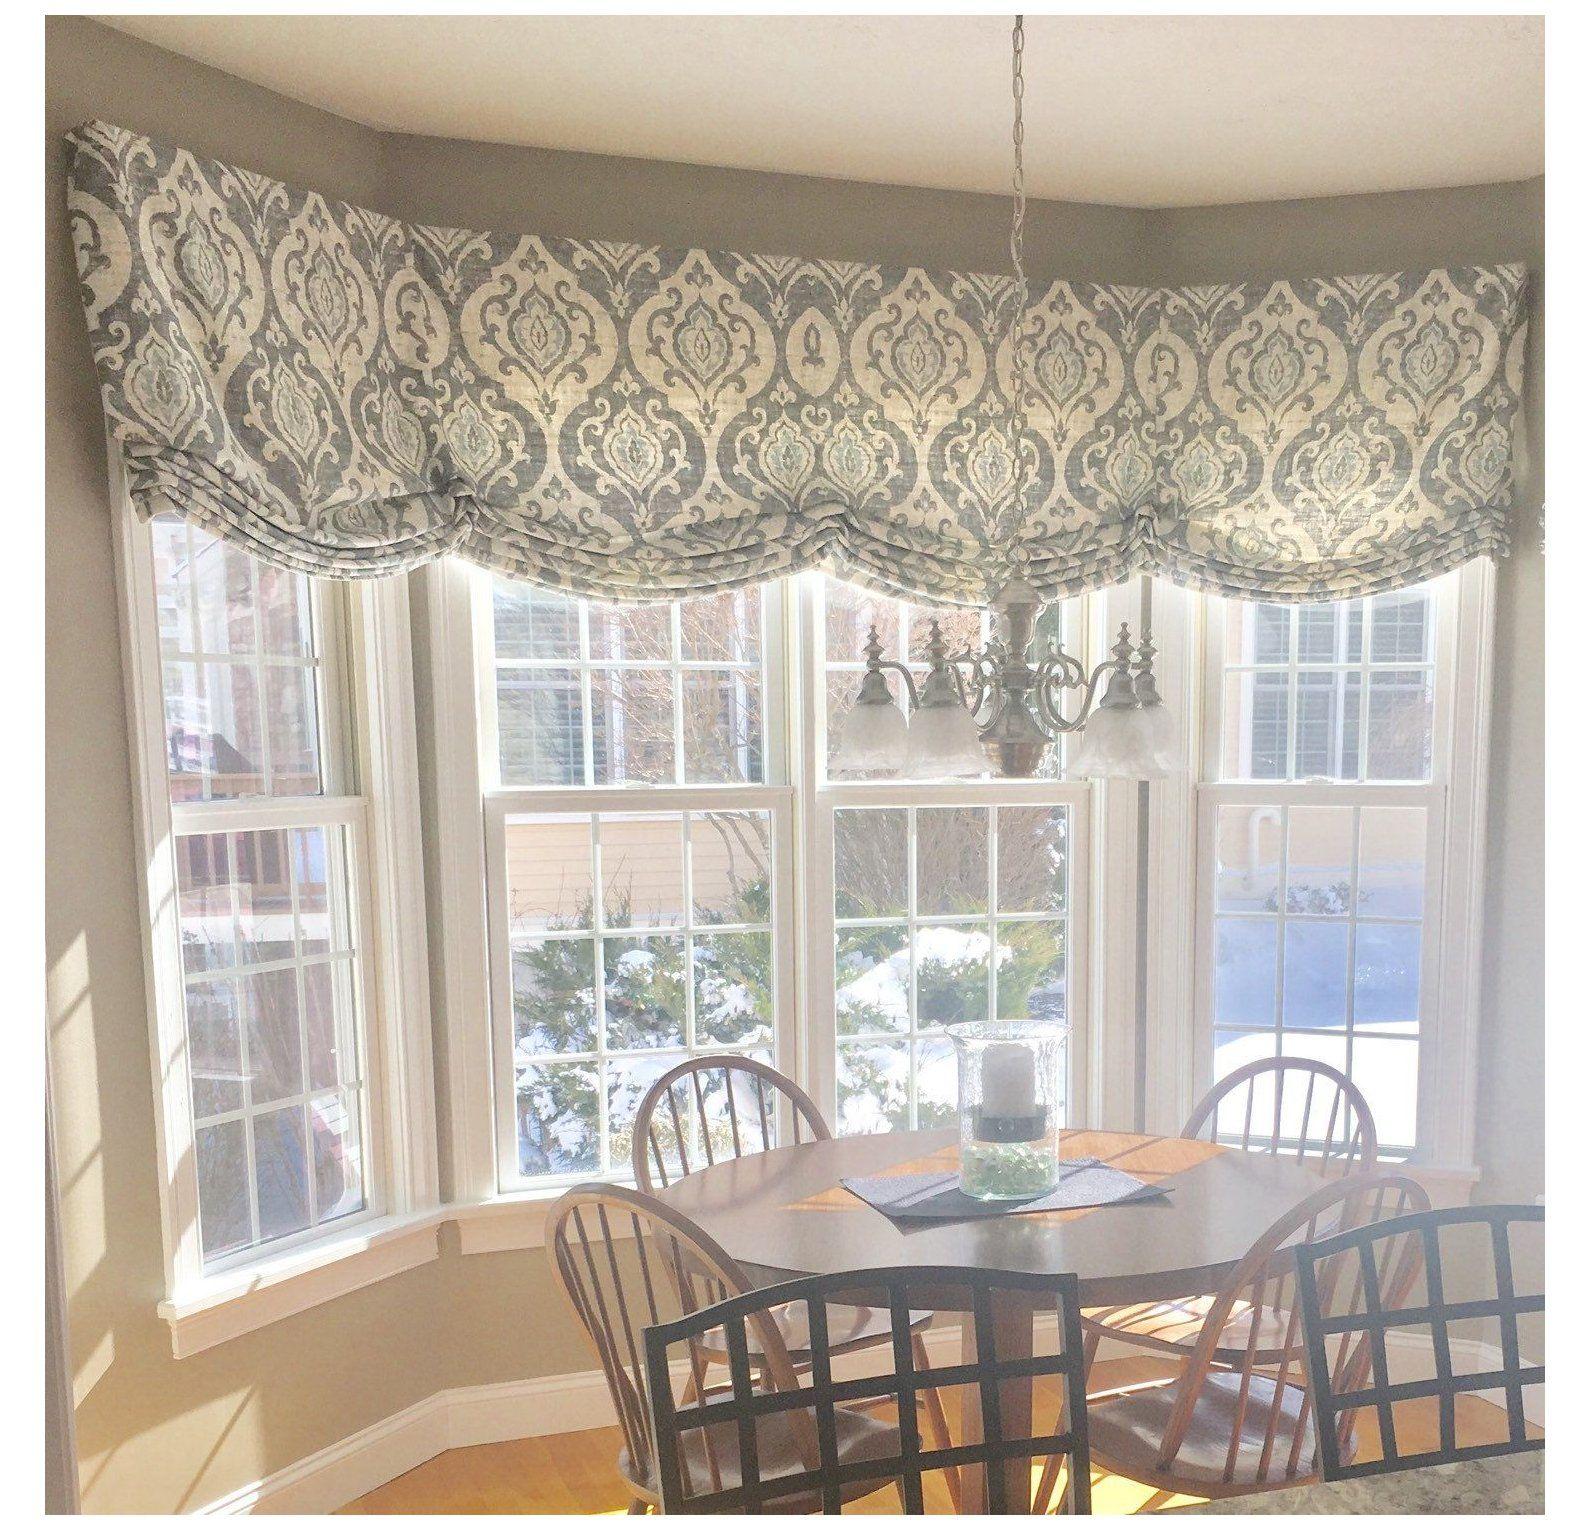 Pin By Trish Zatorski On Windows In 2020 Window Treatments Living Room Roman Shades Living Room Dining Room Windows